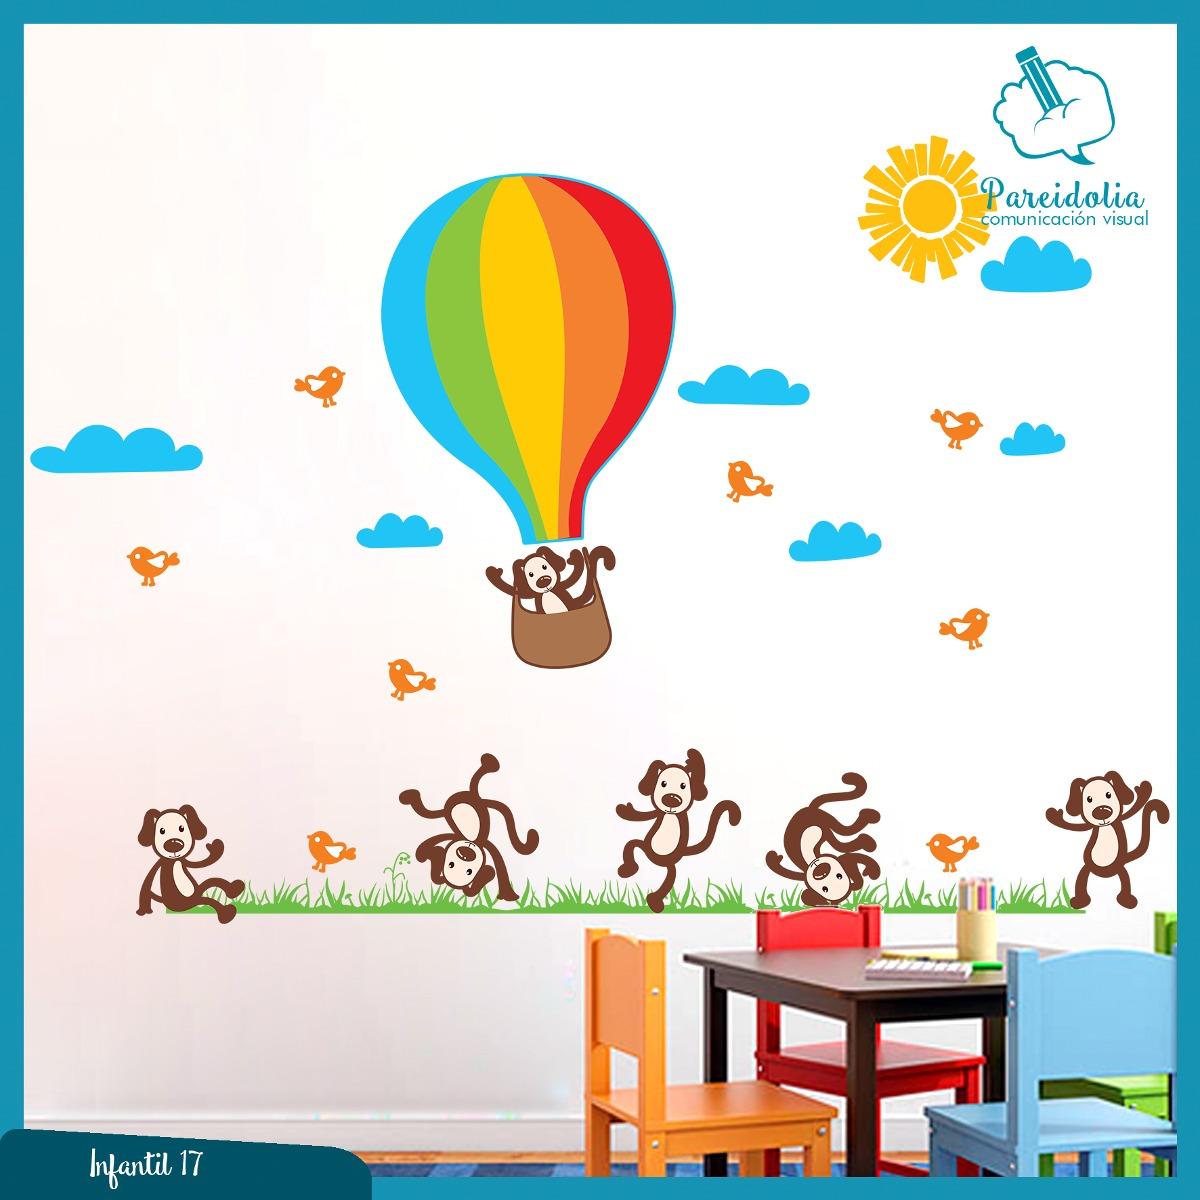 Vinilos decorativos infantiles hogar oficina adhesivos Vinilos decorativos oficina